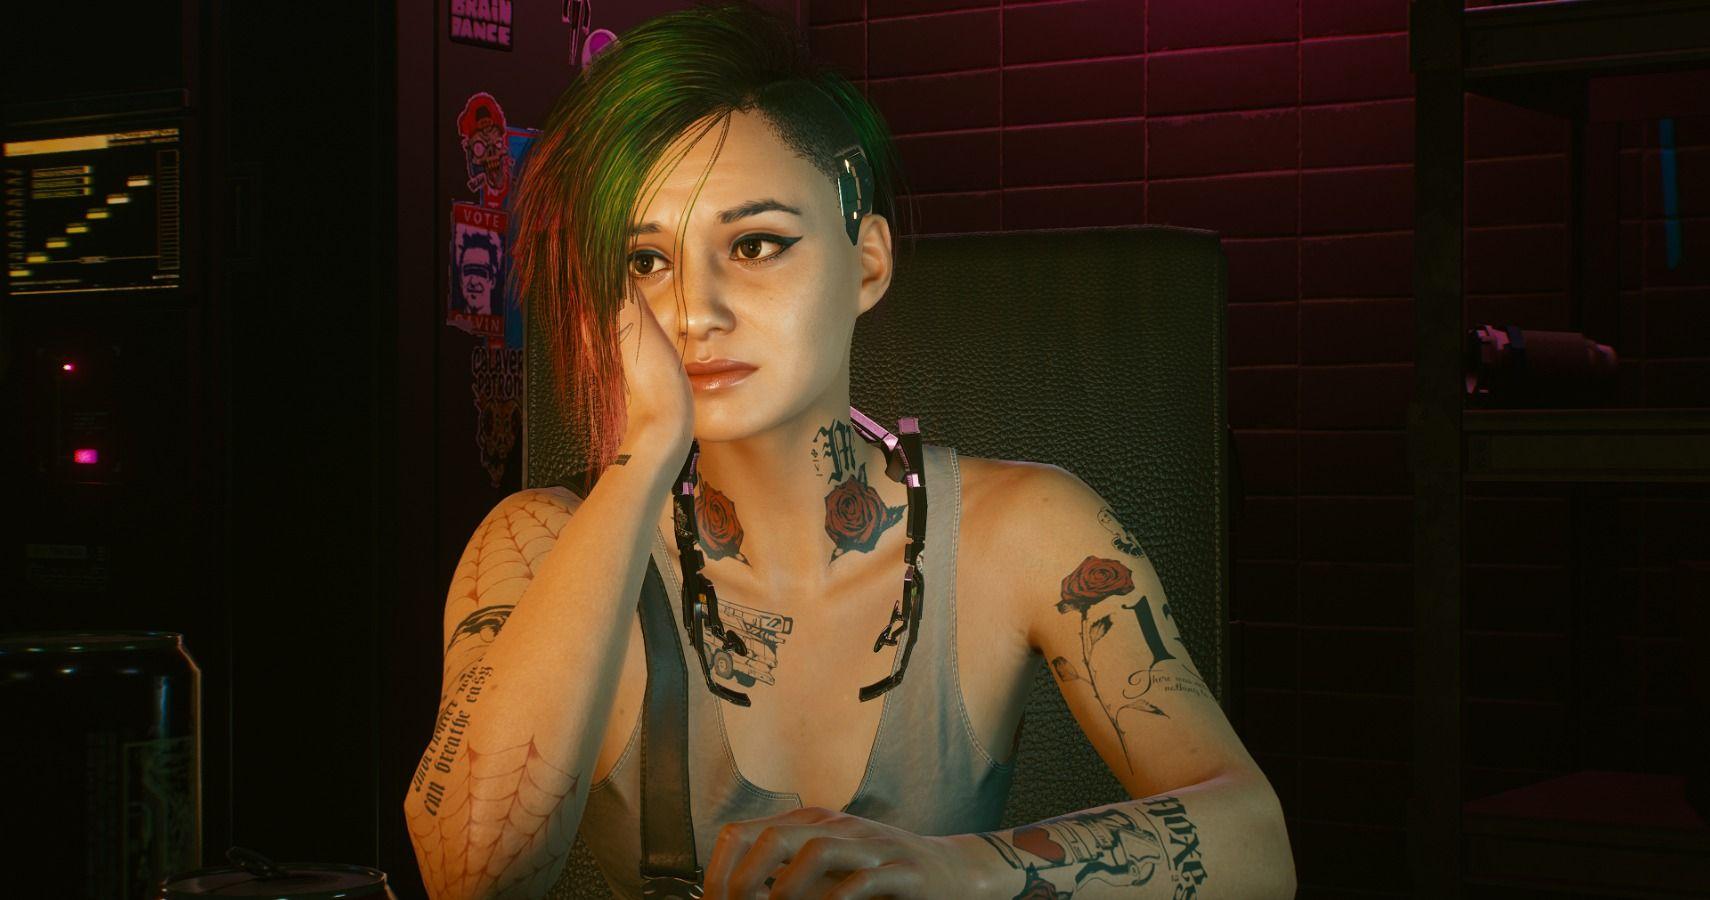 Interview: Carla Tassara On Giving Life To Cyberpunk 2077's Judy Alvarez